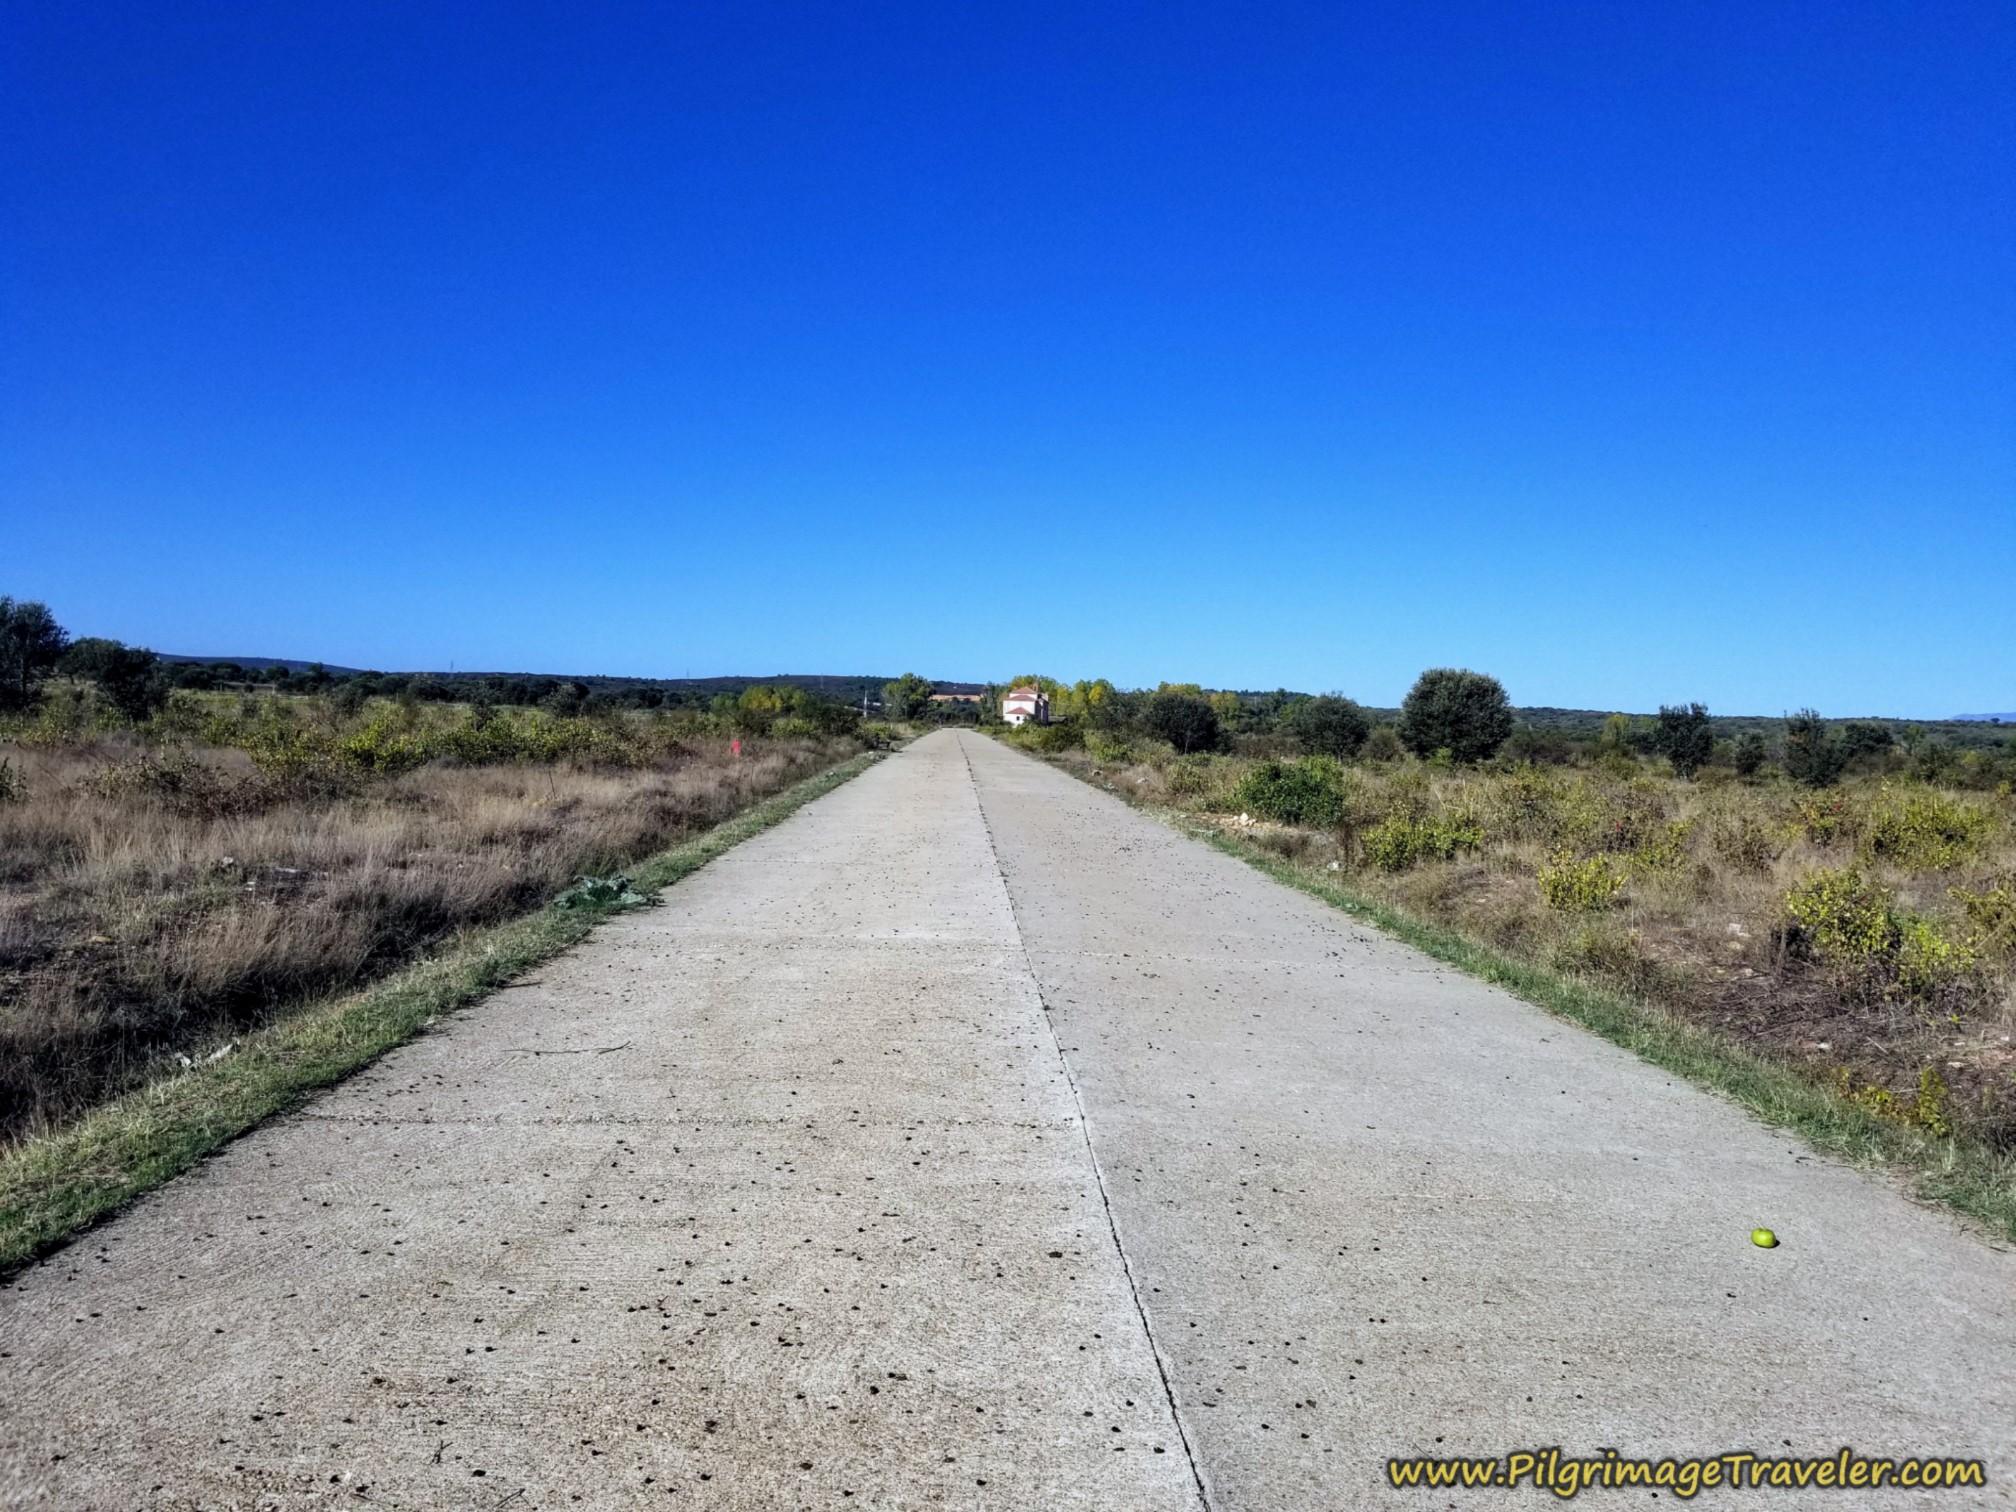 Long Concrete Road After Olleros de Tera